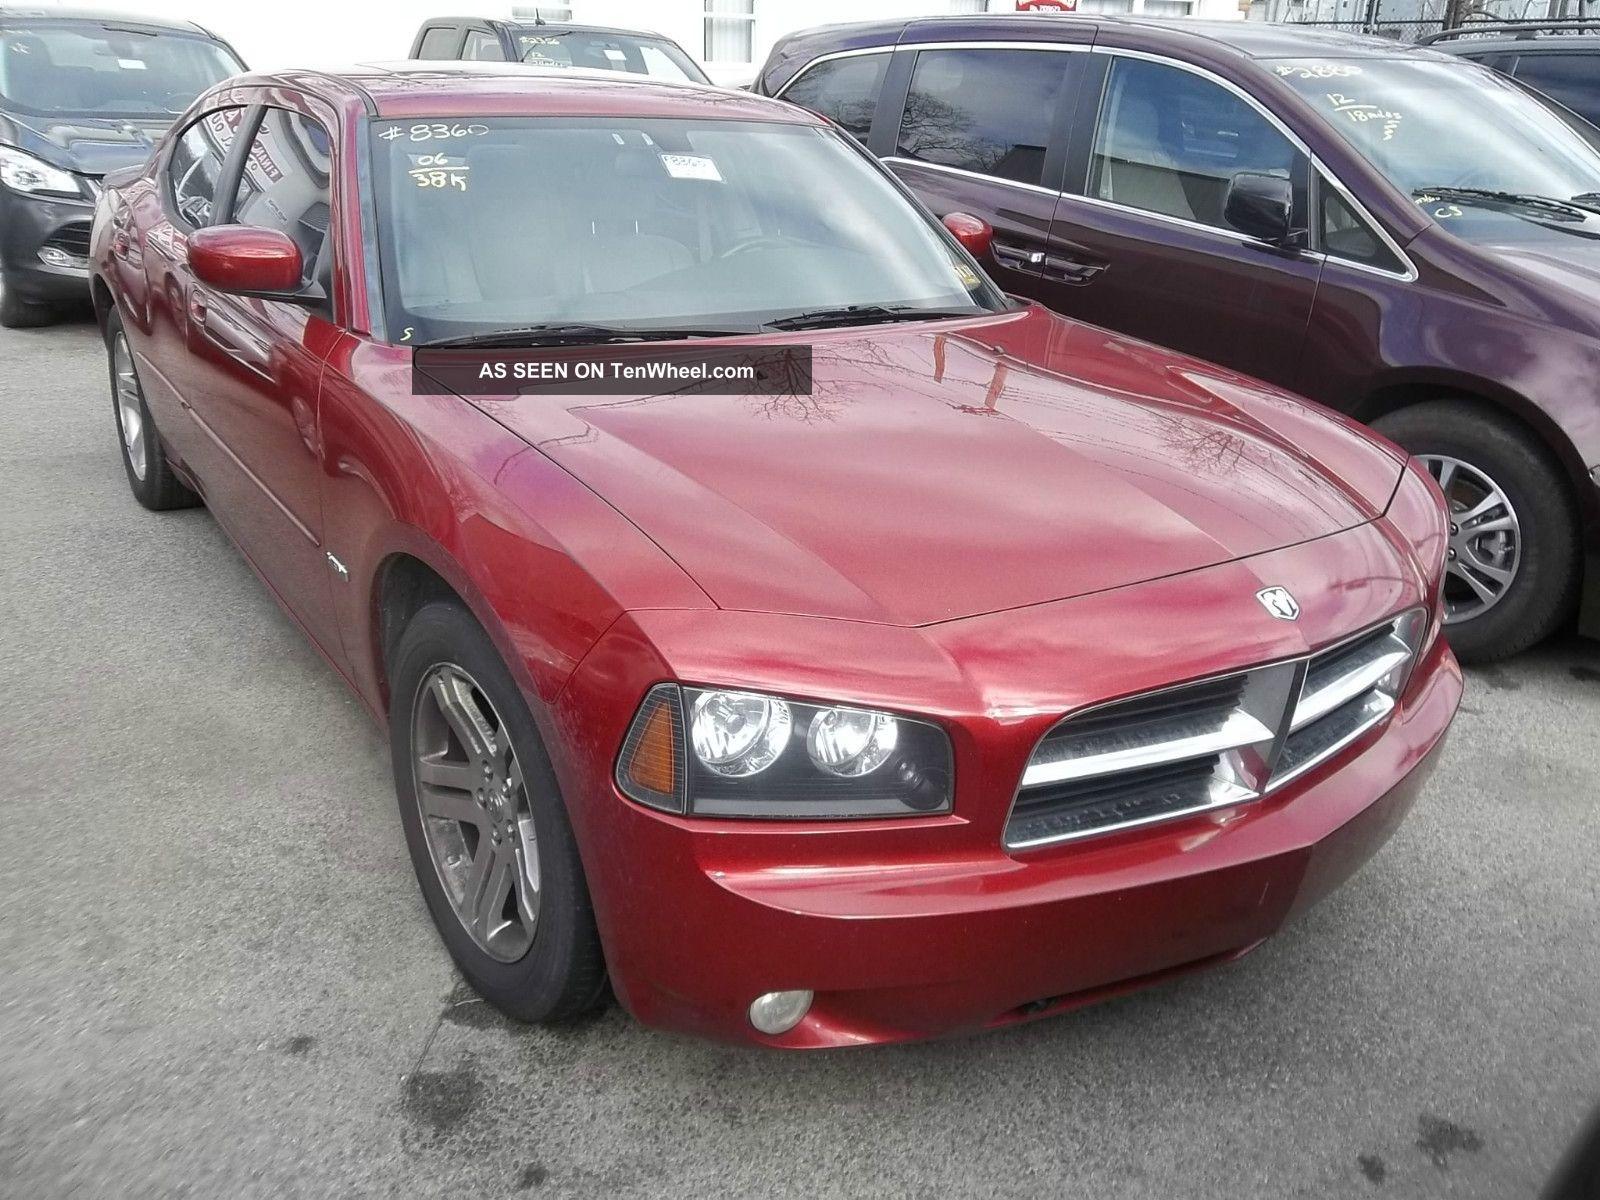 2006 Dodge Charger Rt Hemi Stop Buy  U0026 Take A Look Best Buy